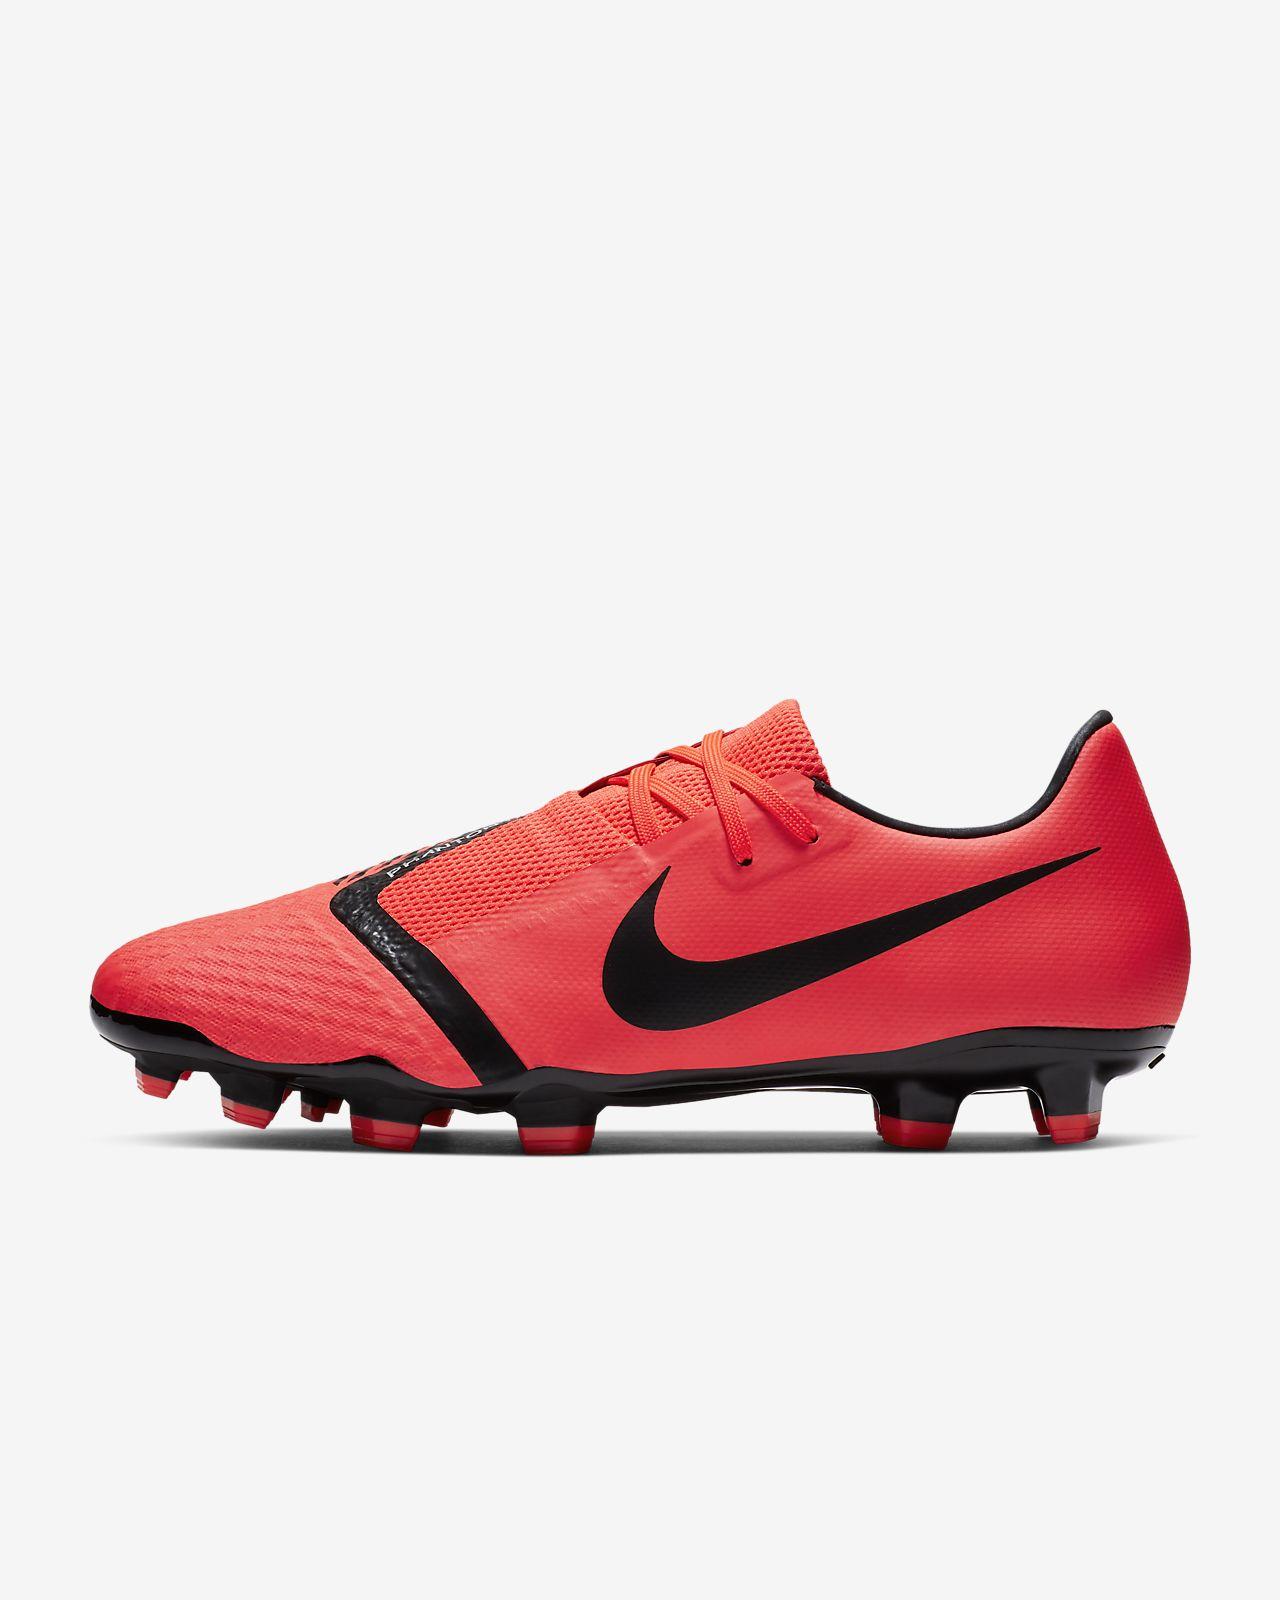 Nike PhantomVNM Academy FG Game Over Botes de futbol per a terreny ferm